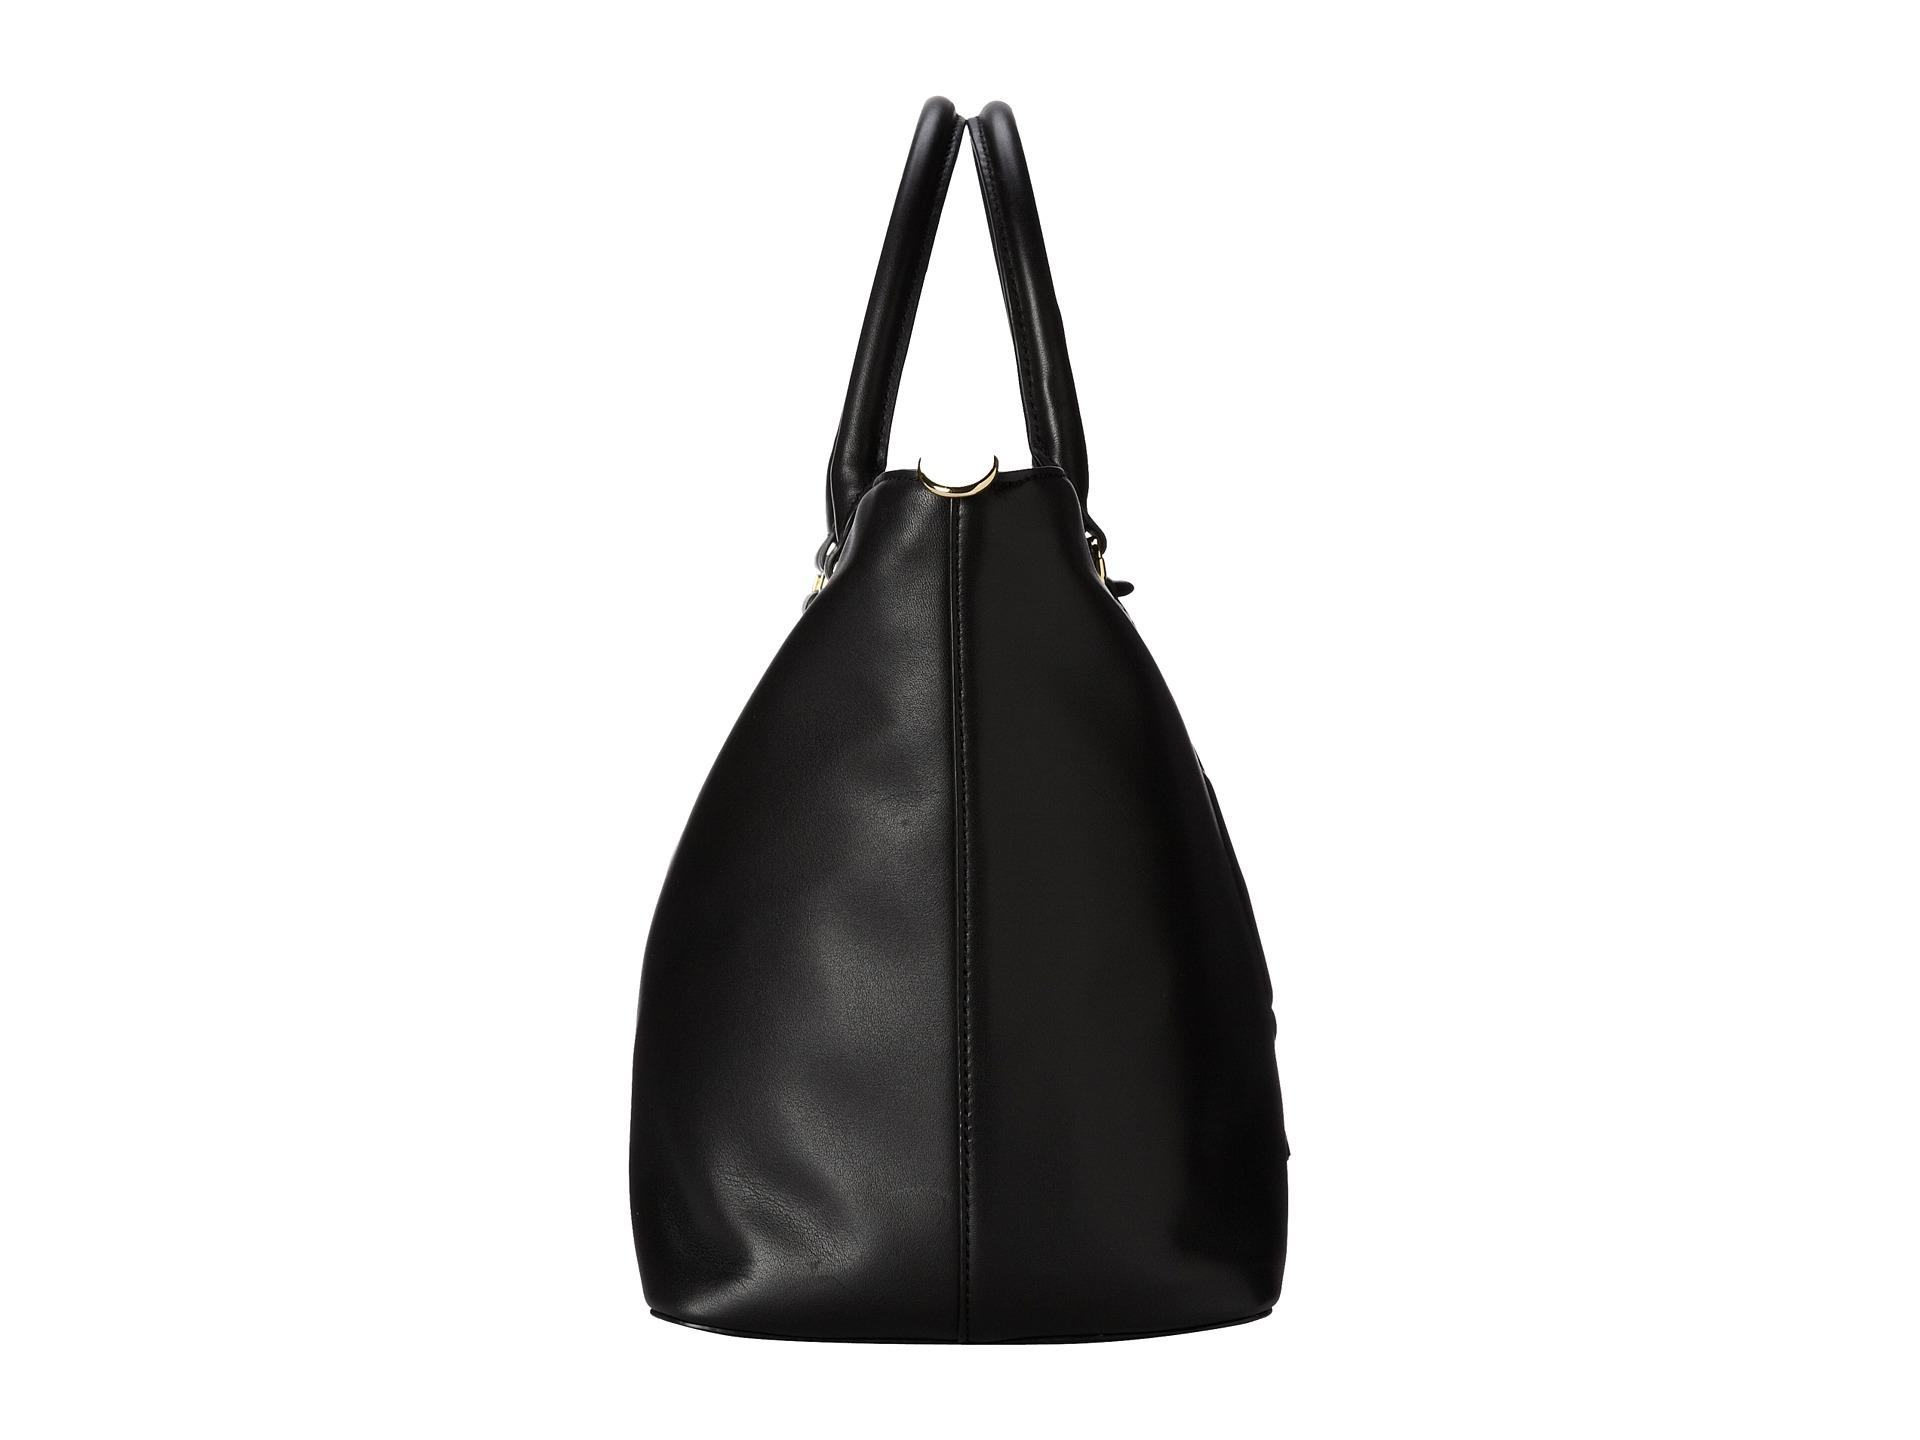 Lyst - Lauren by Ralph Lauren Victoria Convertible Tote in Black 312a7553a7